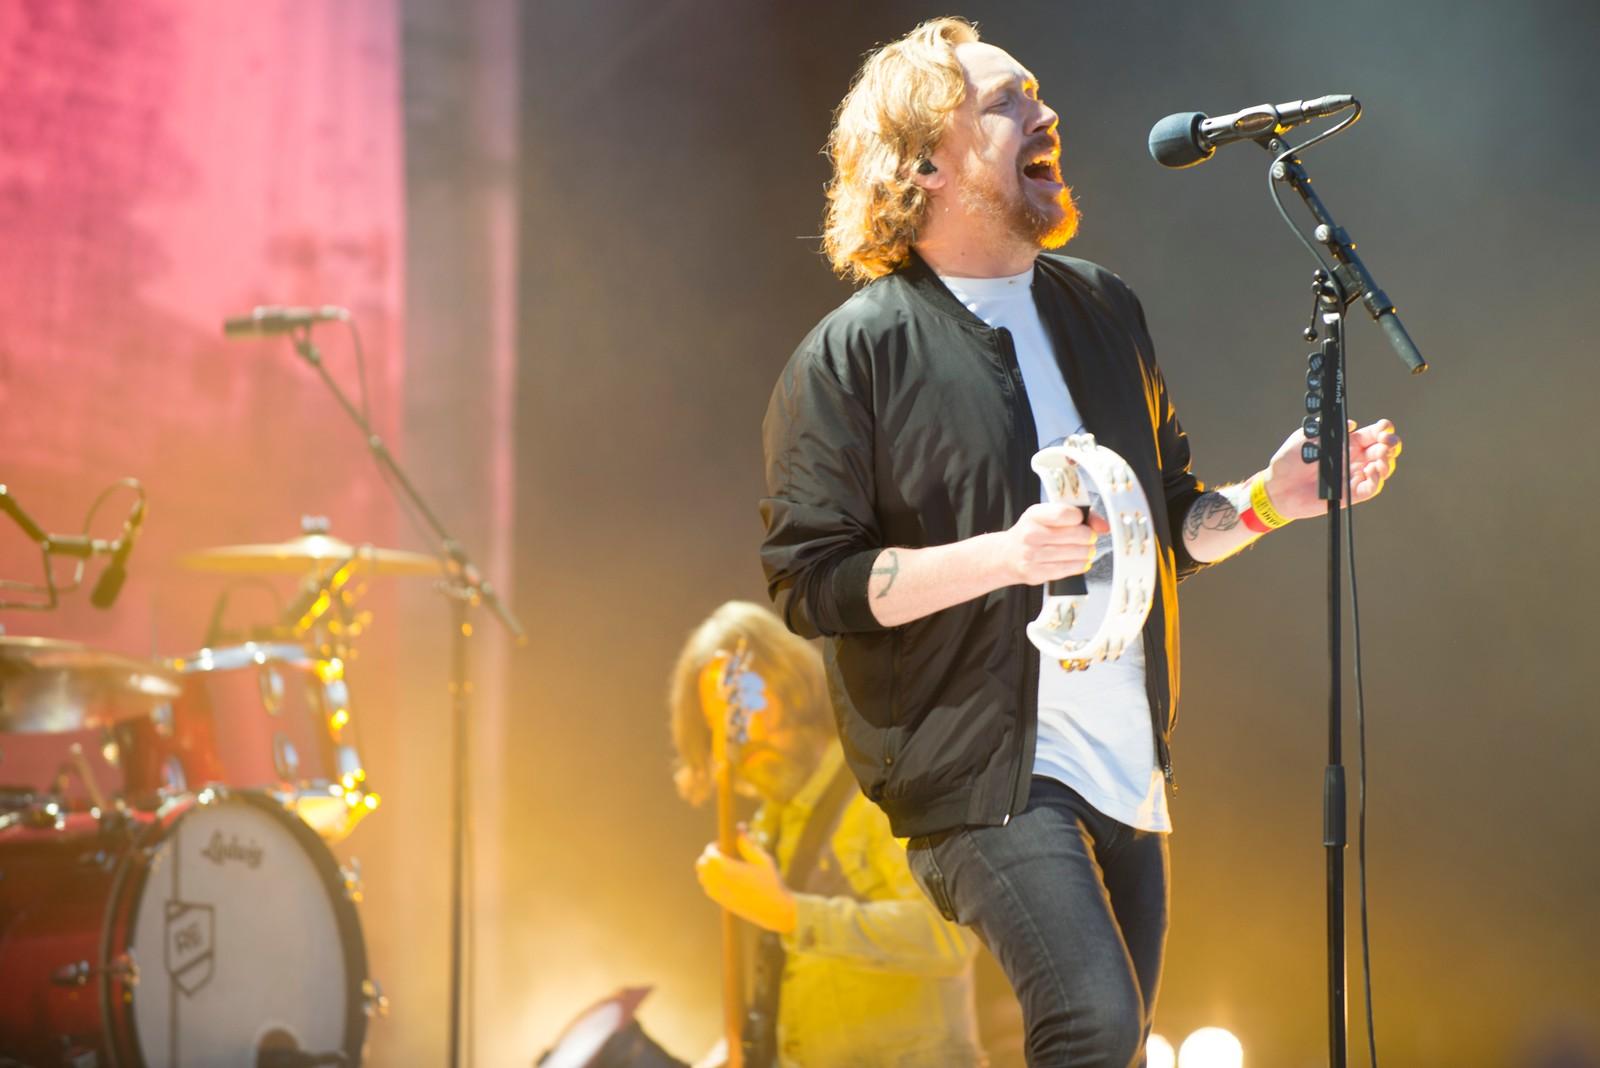 Den svenske publikumsfavoritten Lars Winnerbäck avsluttet månefestivalens konsertprogram på hovedscenen.